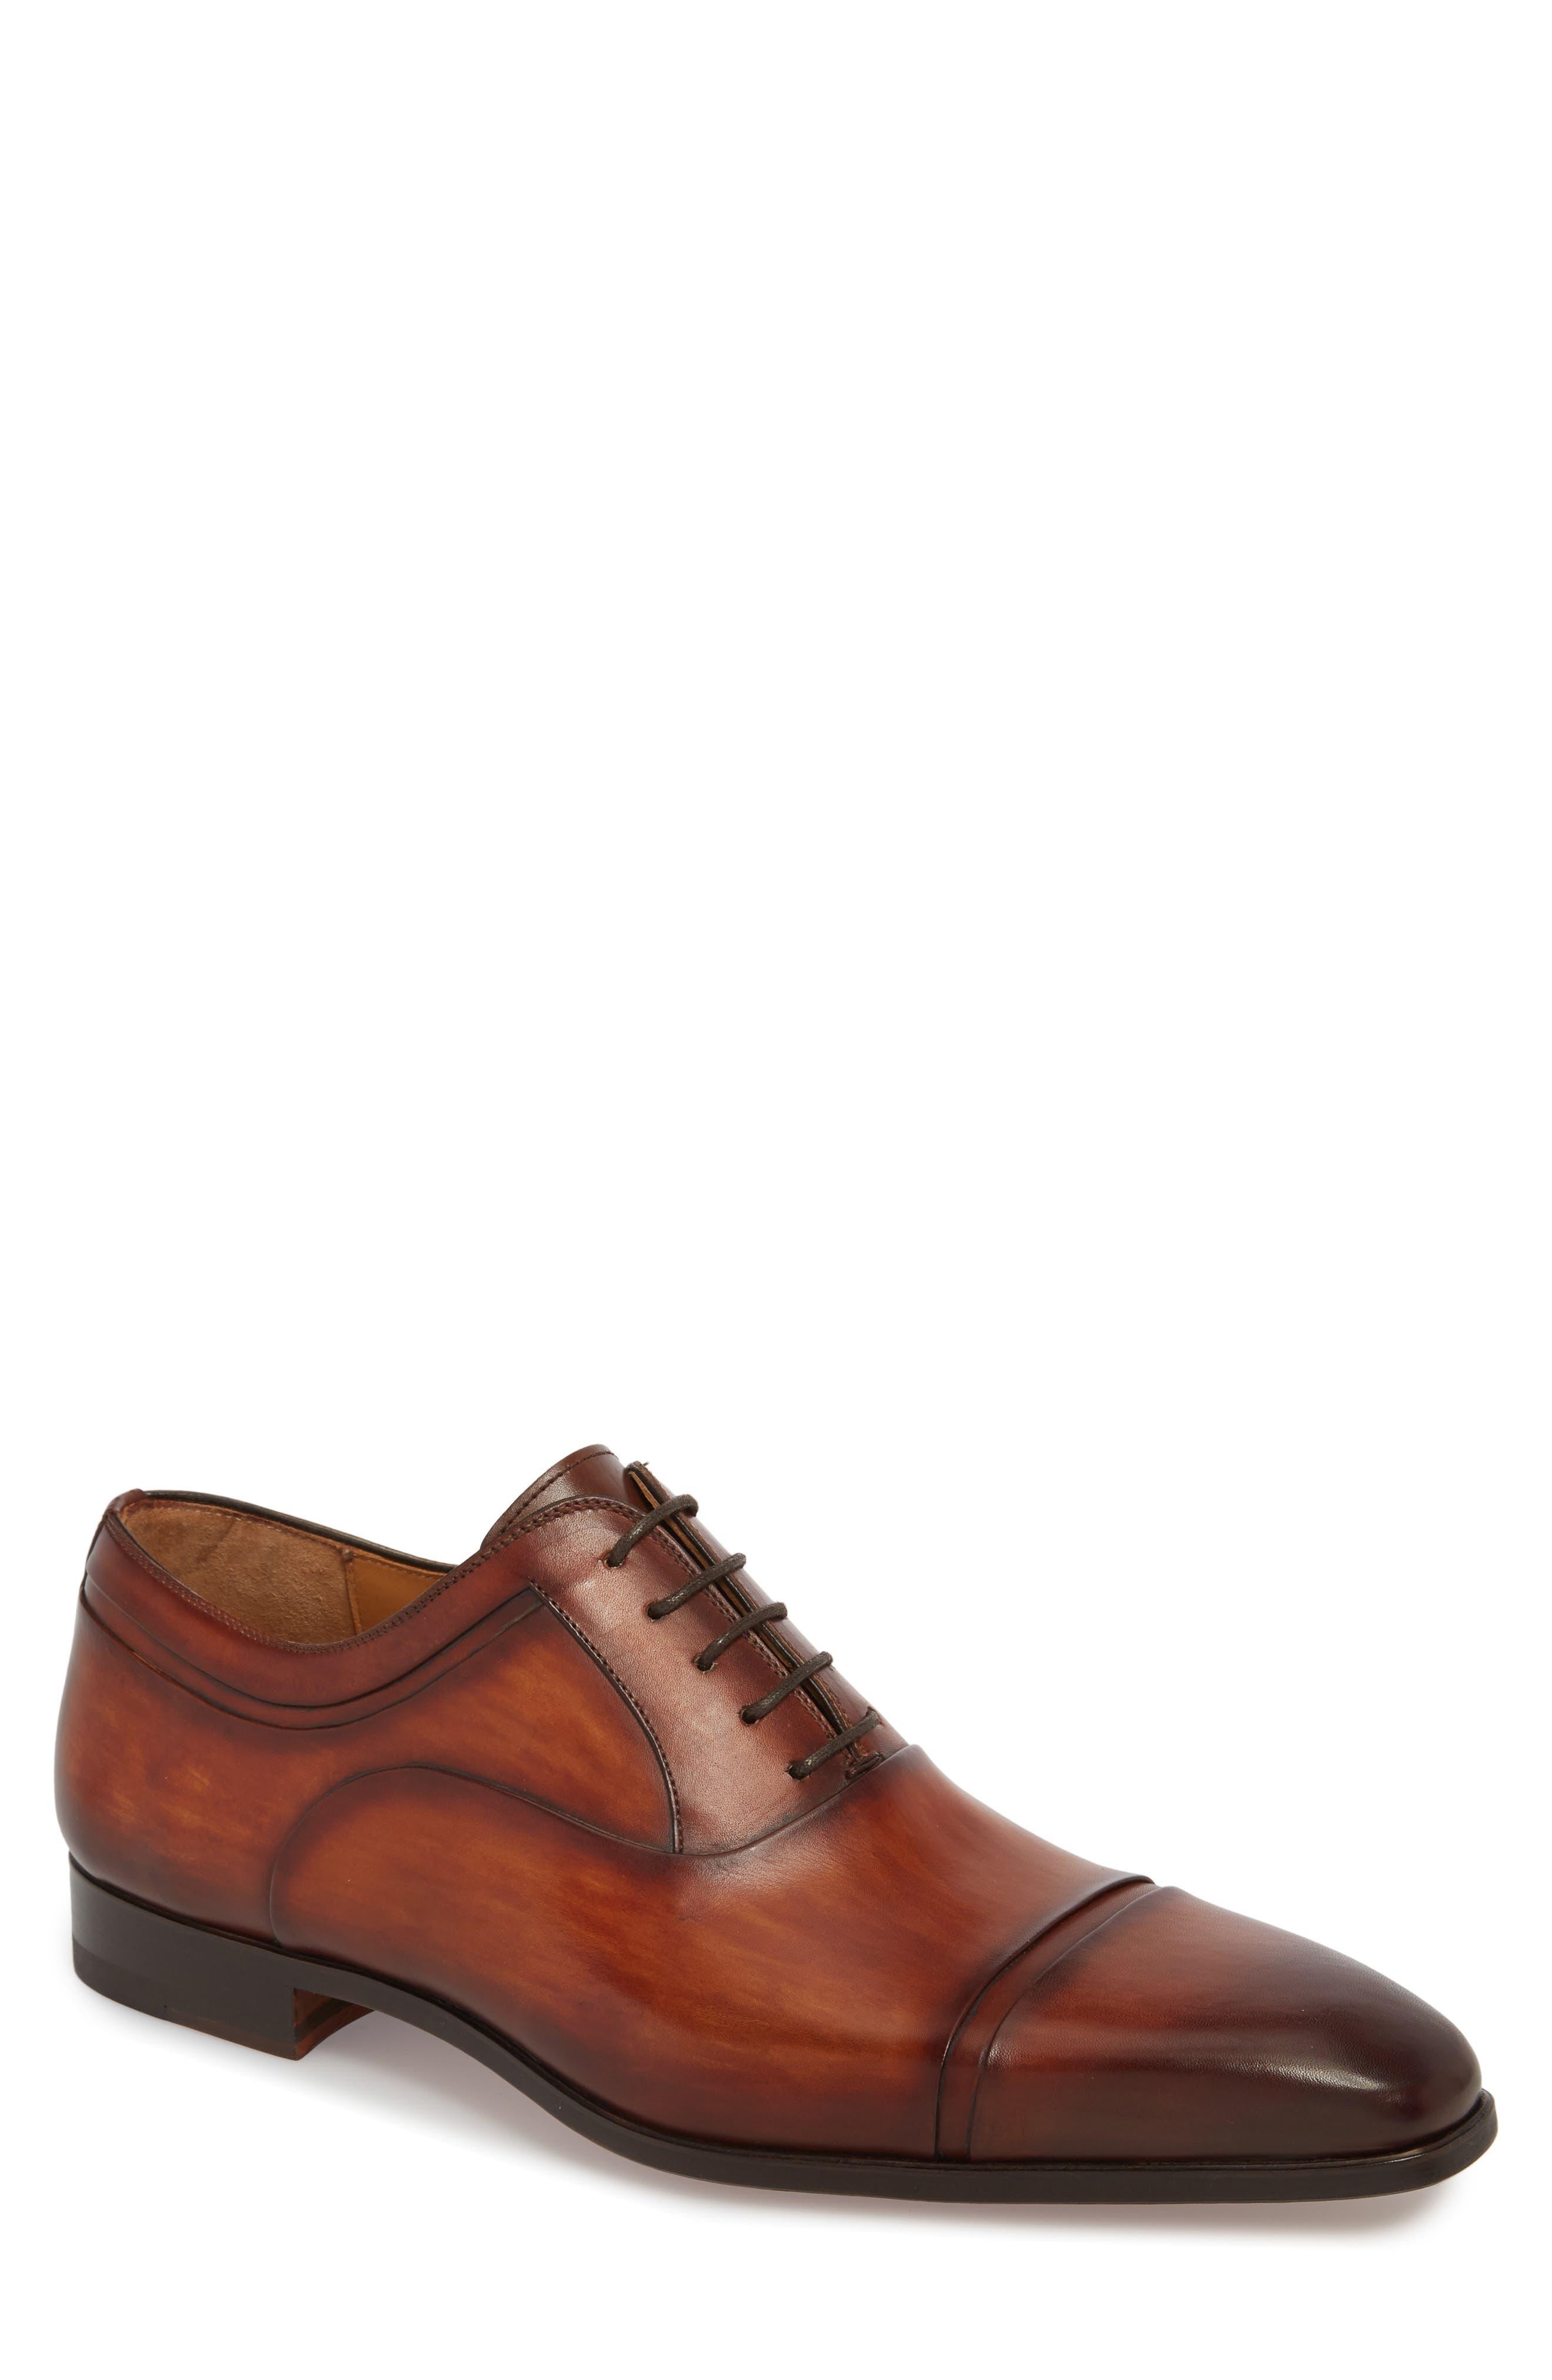 Tobin Cap Toe Oxford,                             Main thumbnail 1, color,                             Cognac Leather